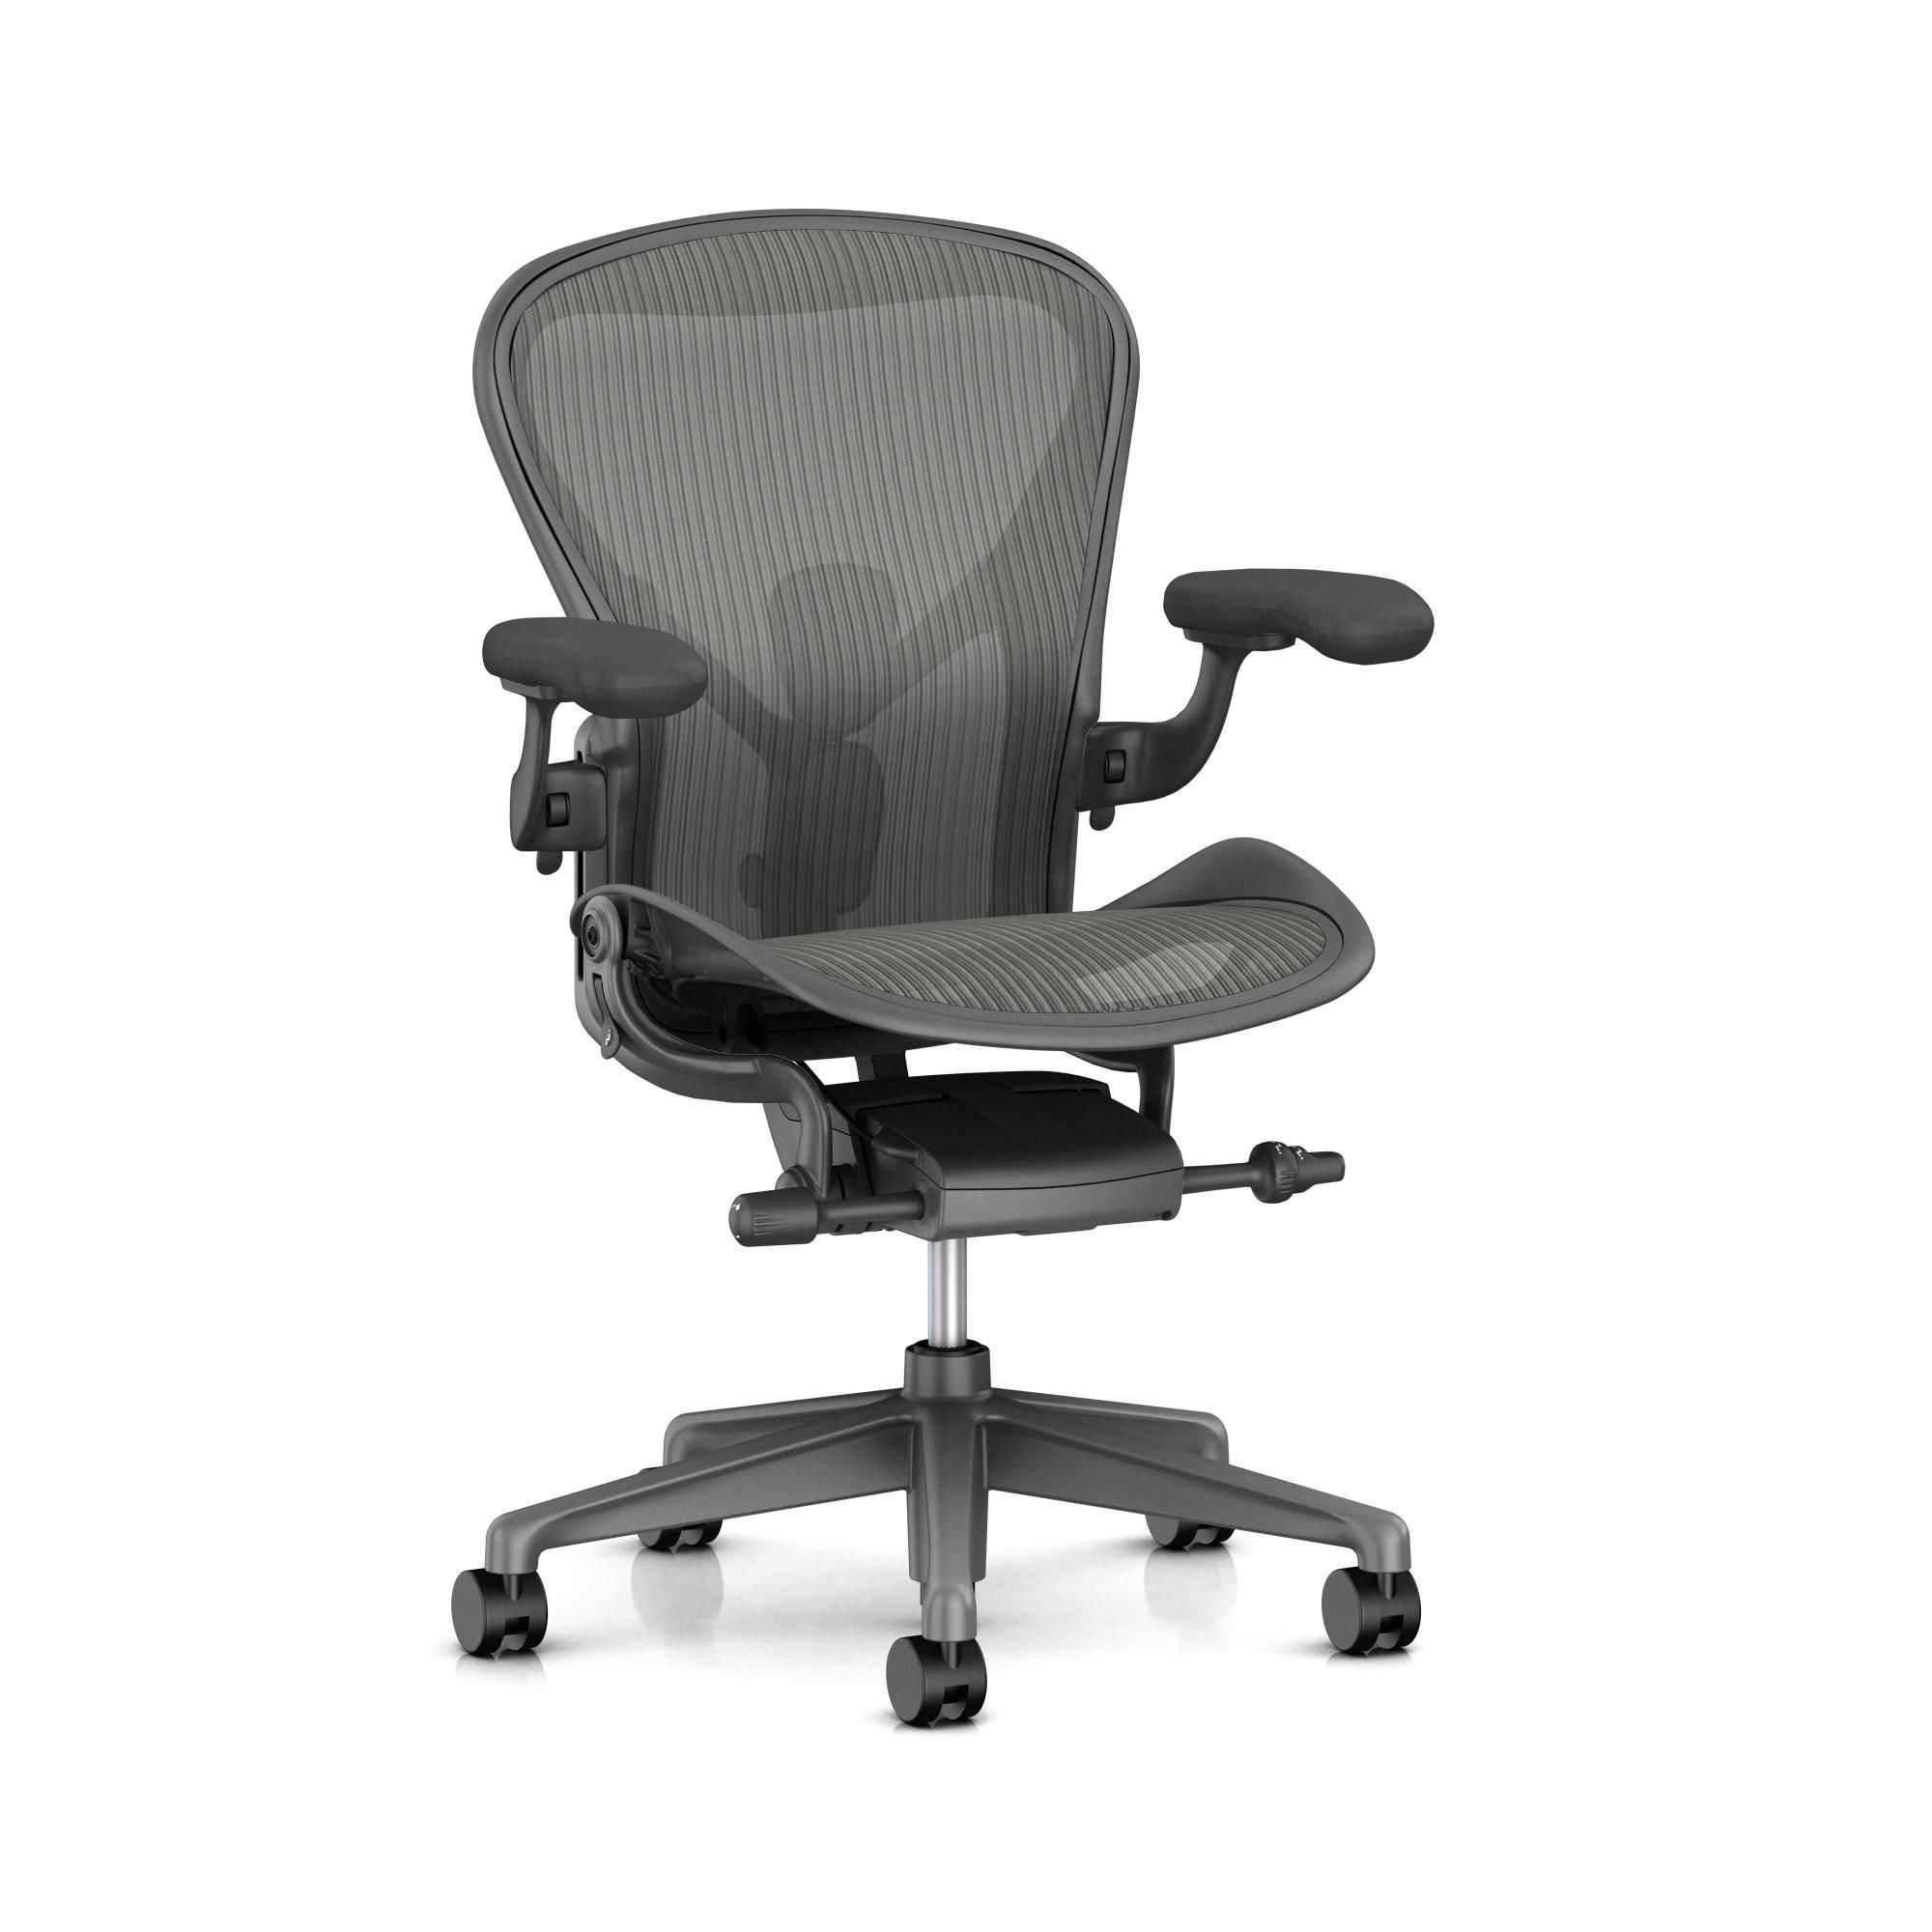 Aeron - Herman Miller - Carbon / Satin Carbon / Dual Posture Fit